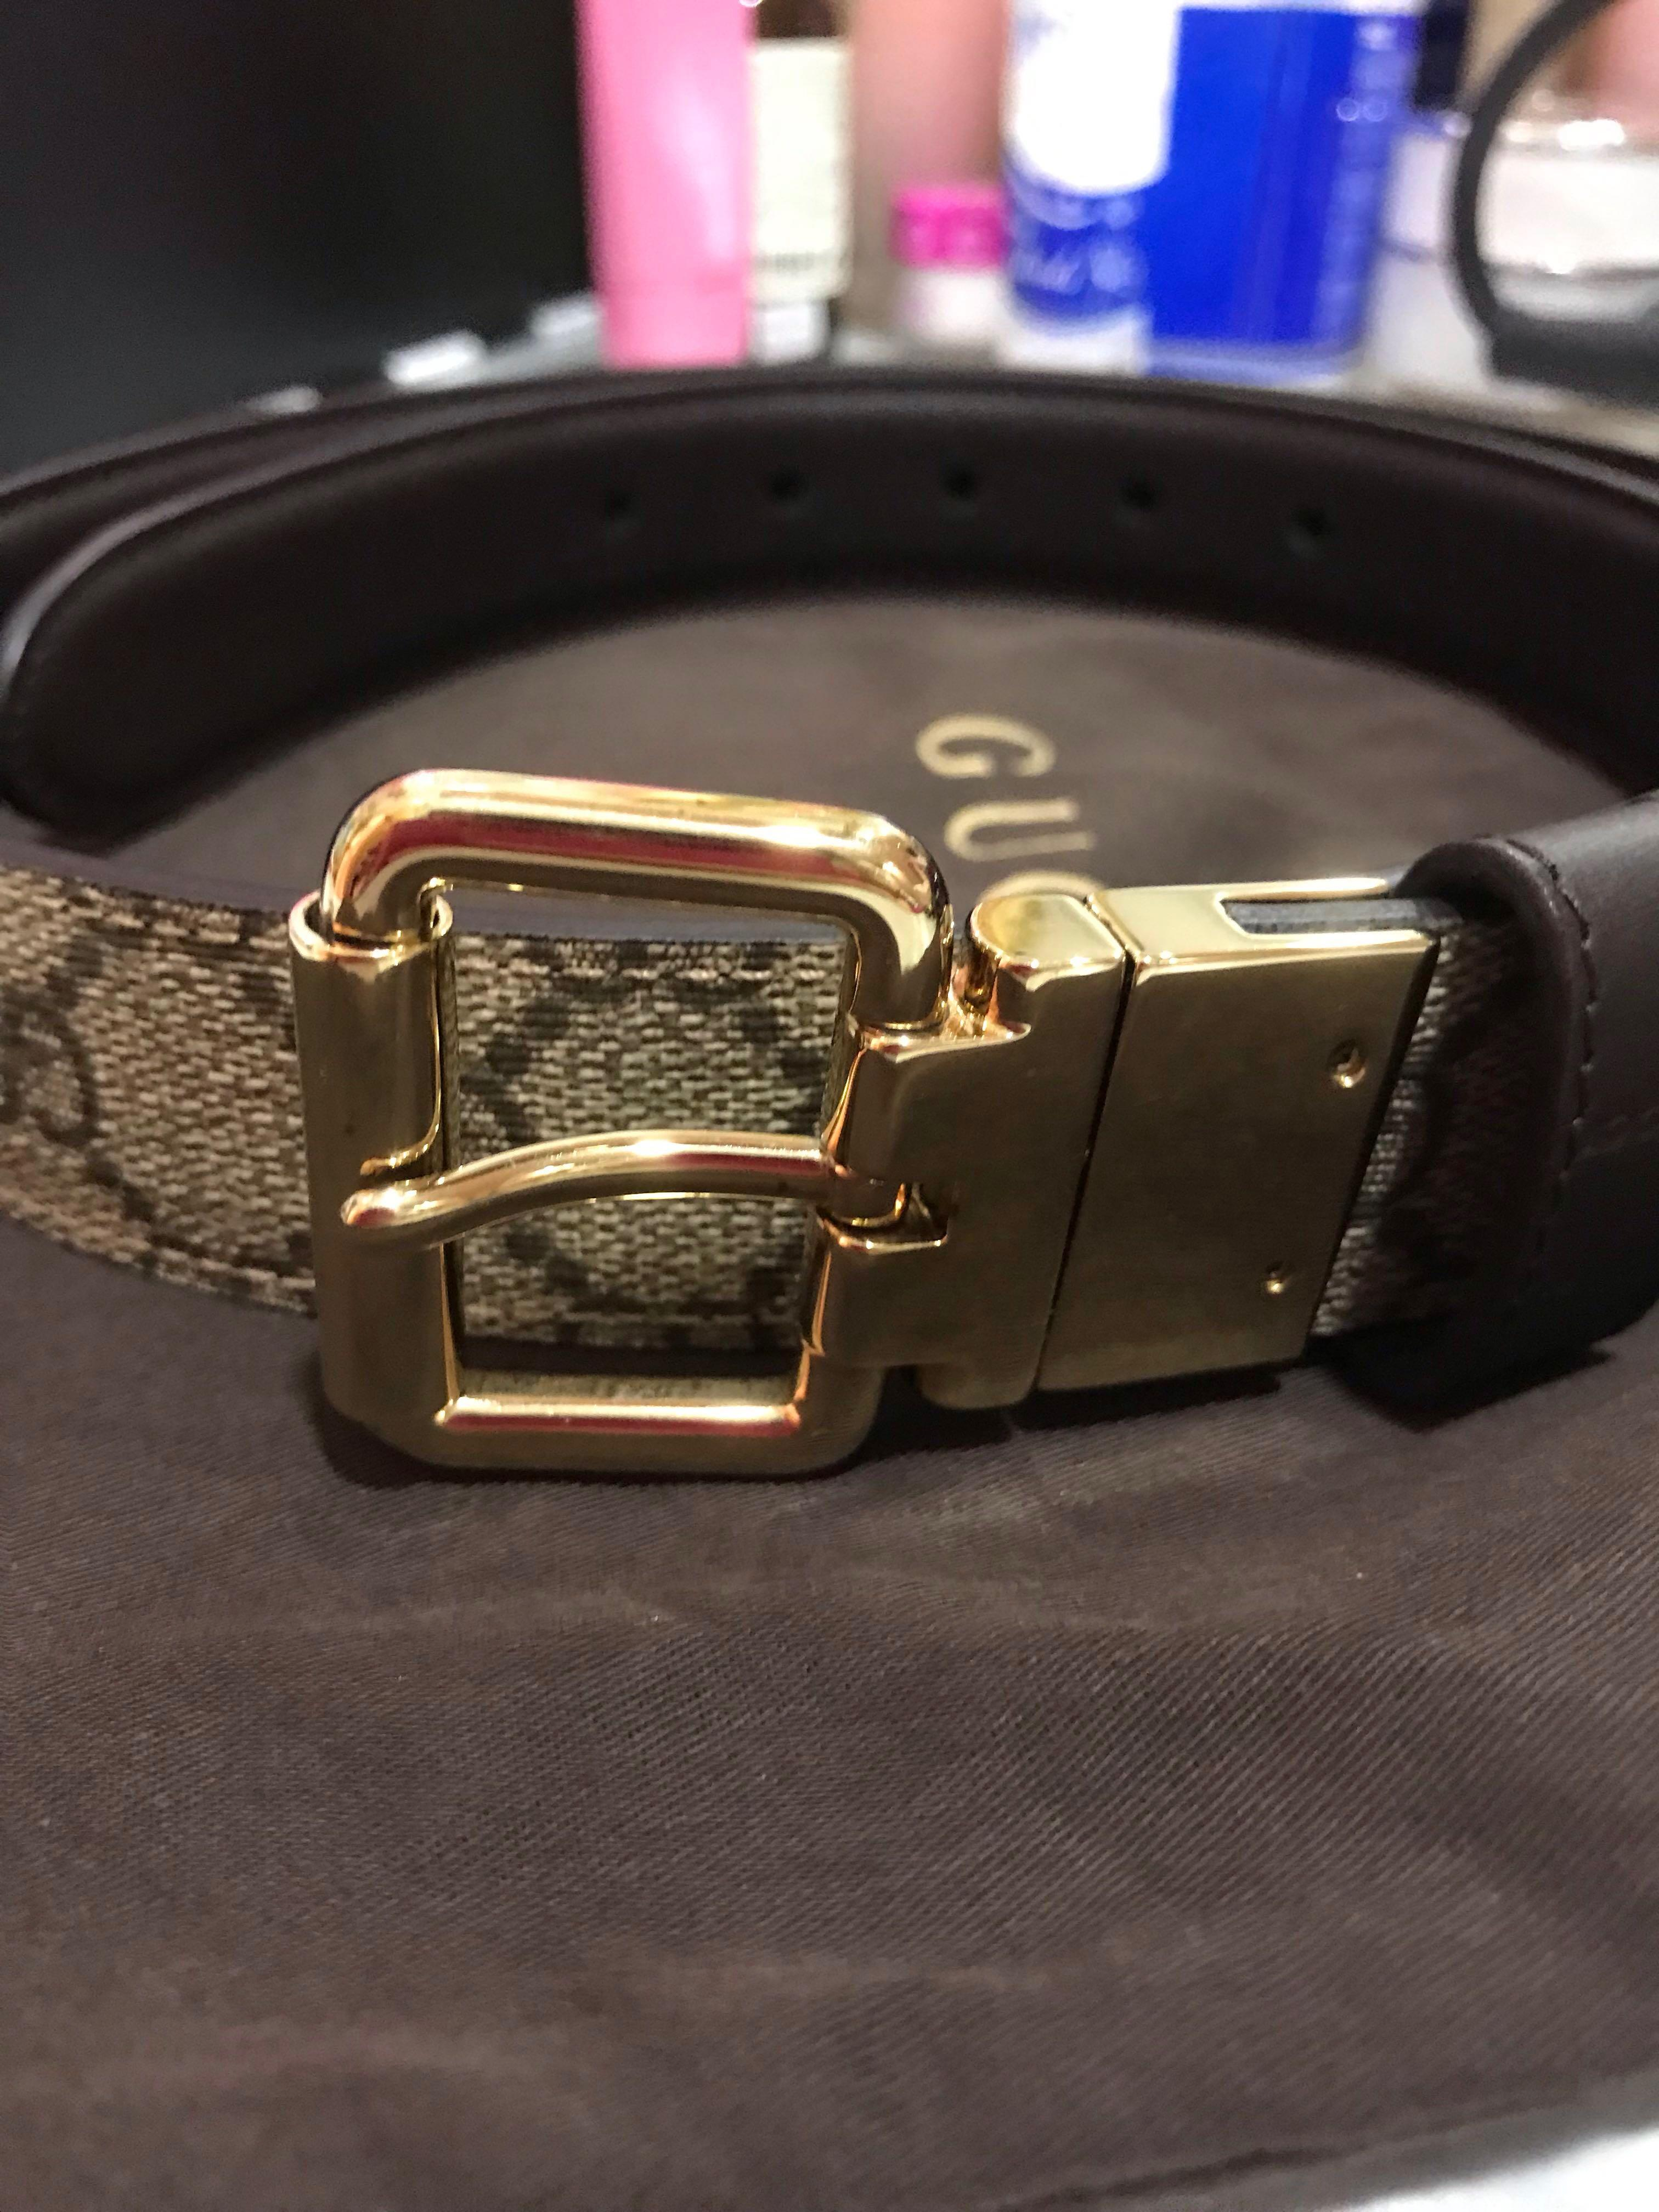 Gucci monogram reversible belt in size 85cm